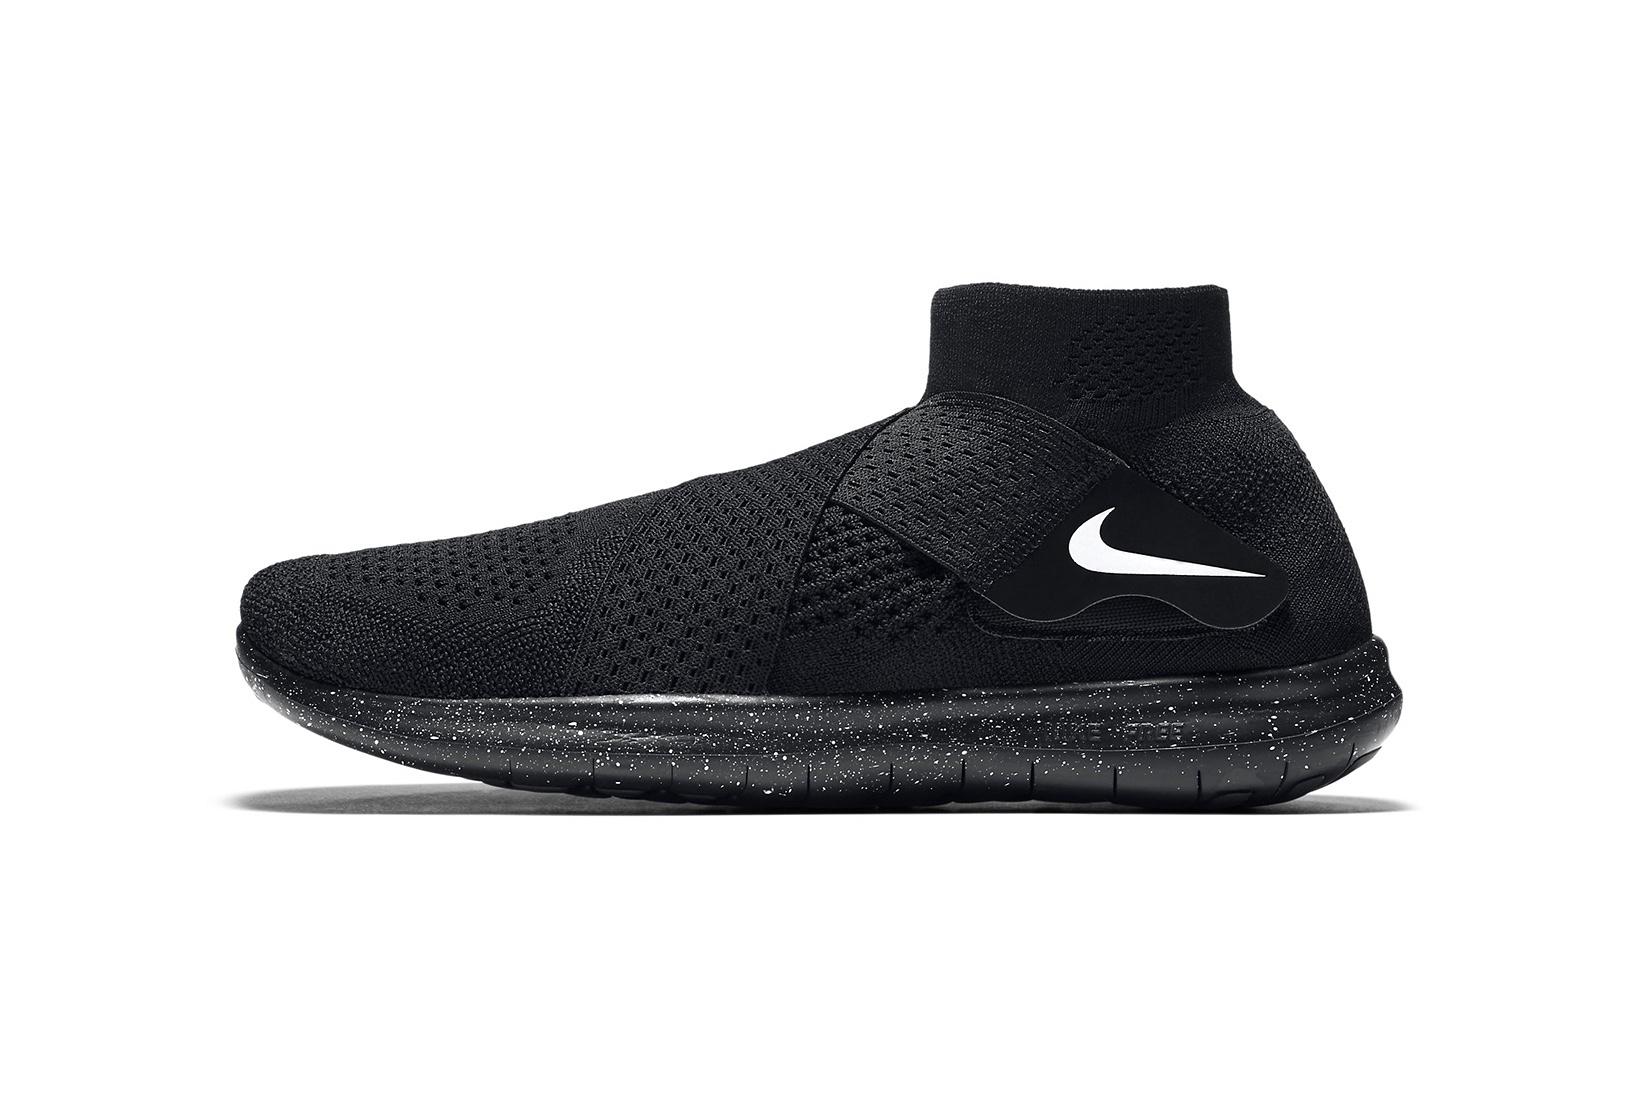 UNDERCOVER x NikeLab Release GYAKUSOU Footwear For Summer 2017